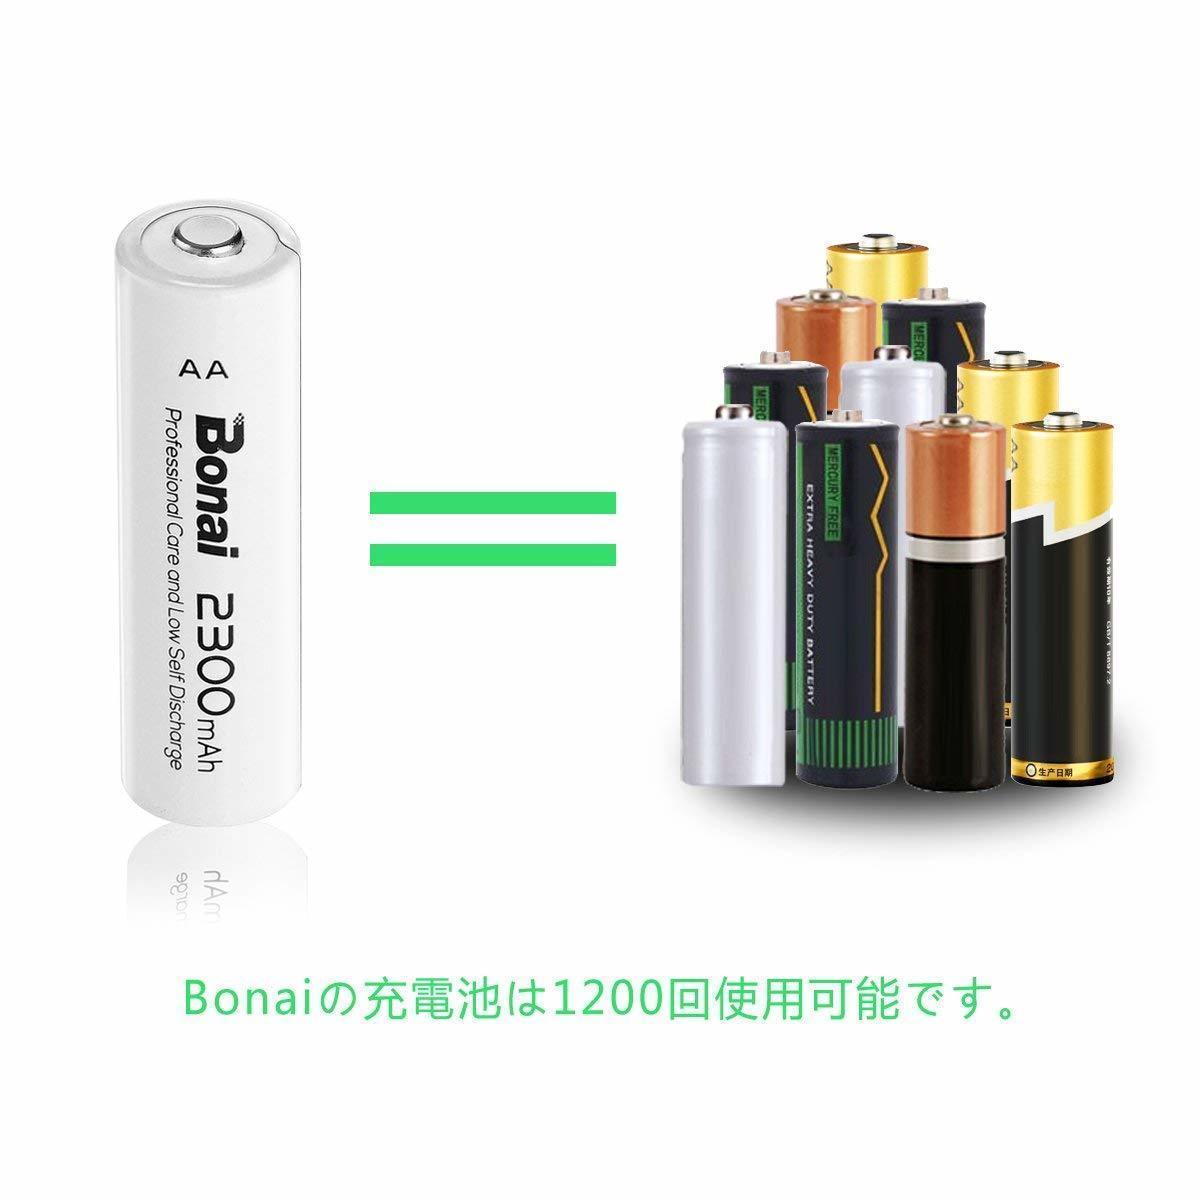 [新品/送料無料] Bonai 単3形 充電池 充電式ニッケル水素電池 24個パック PSE/CE取得 UL認証済み(高容量2300mAh 約1200回使用可能)_画像2